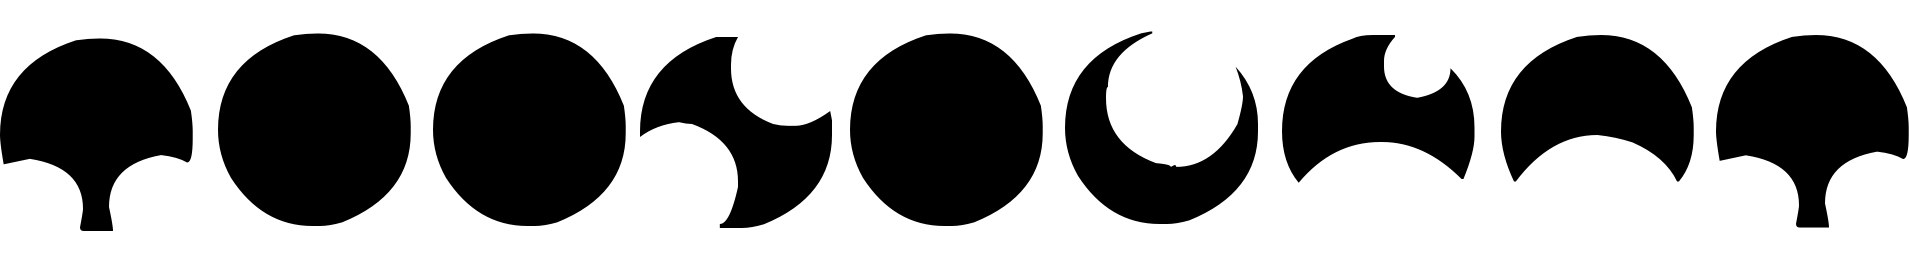 Moonogram